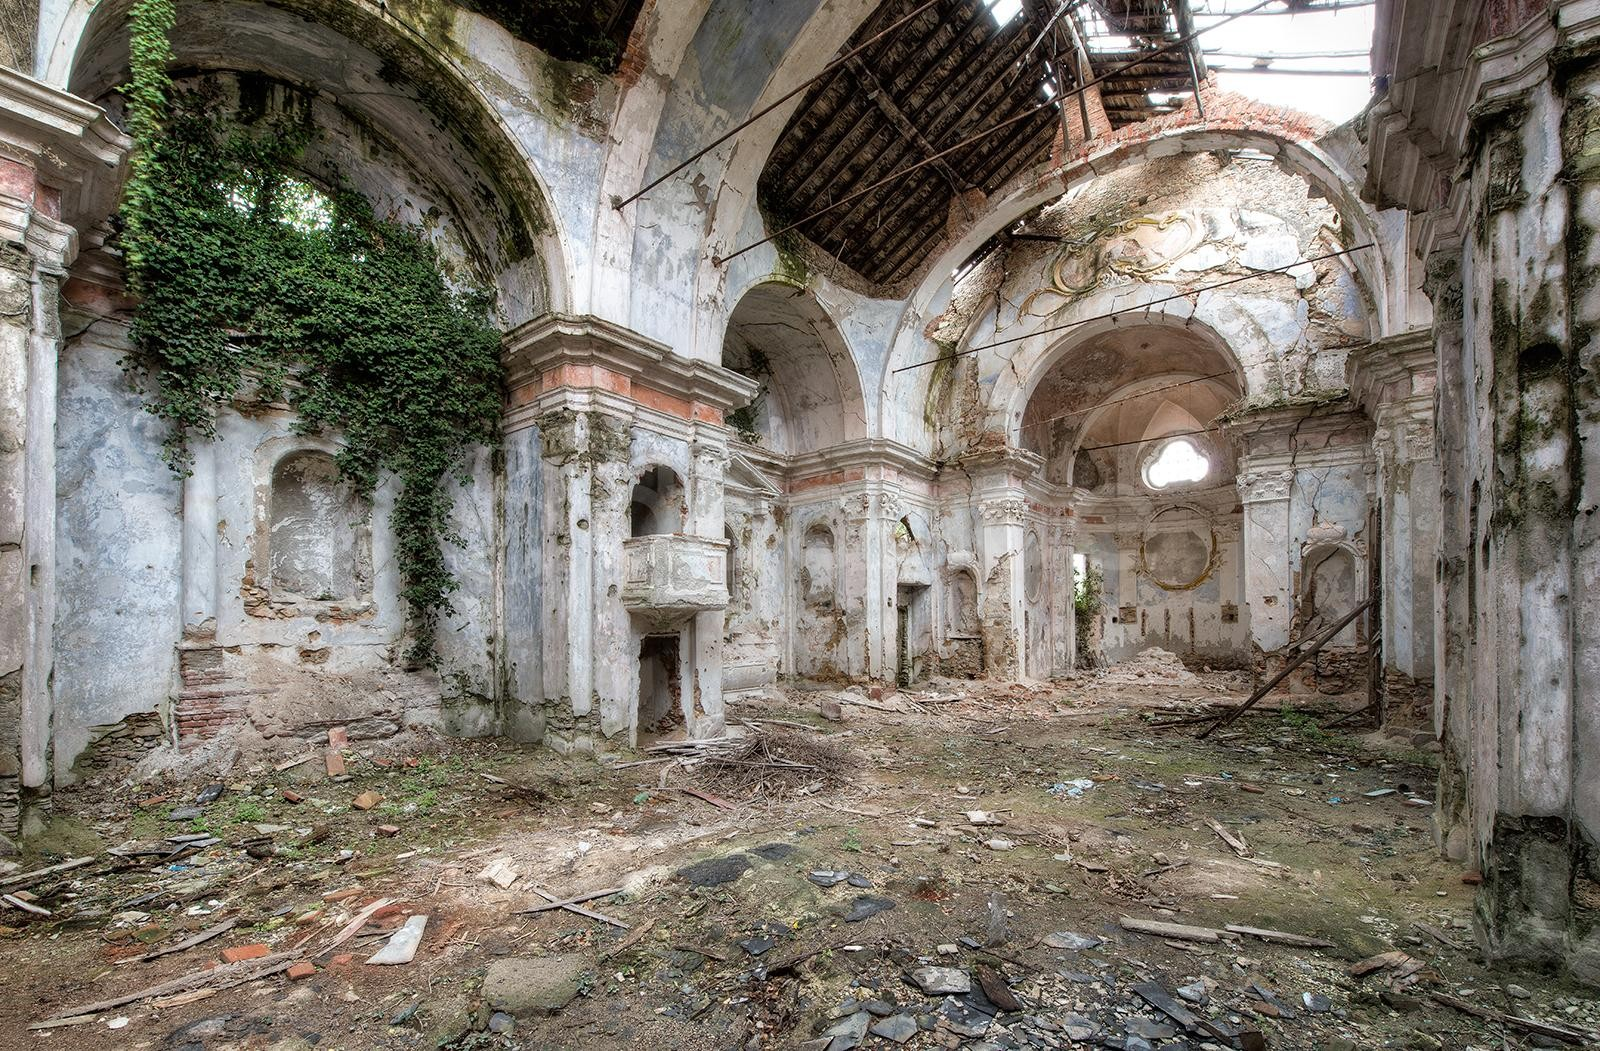 Daanoe - Forgotten Balcony